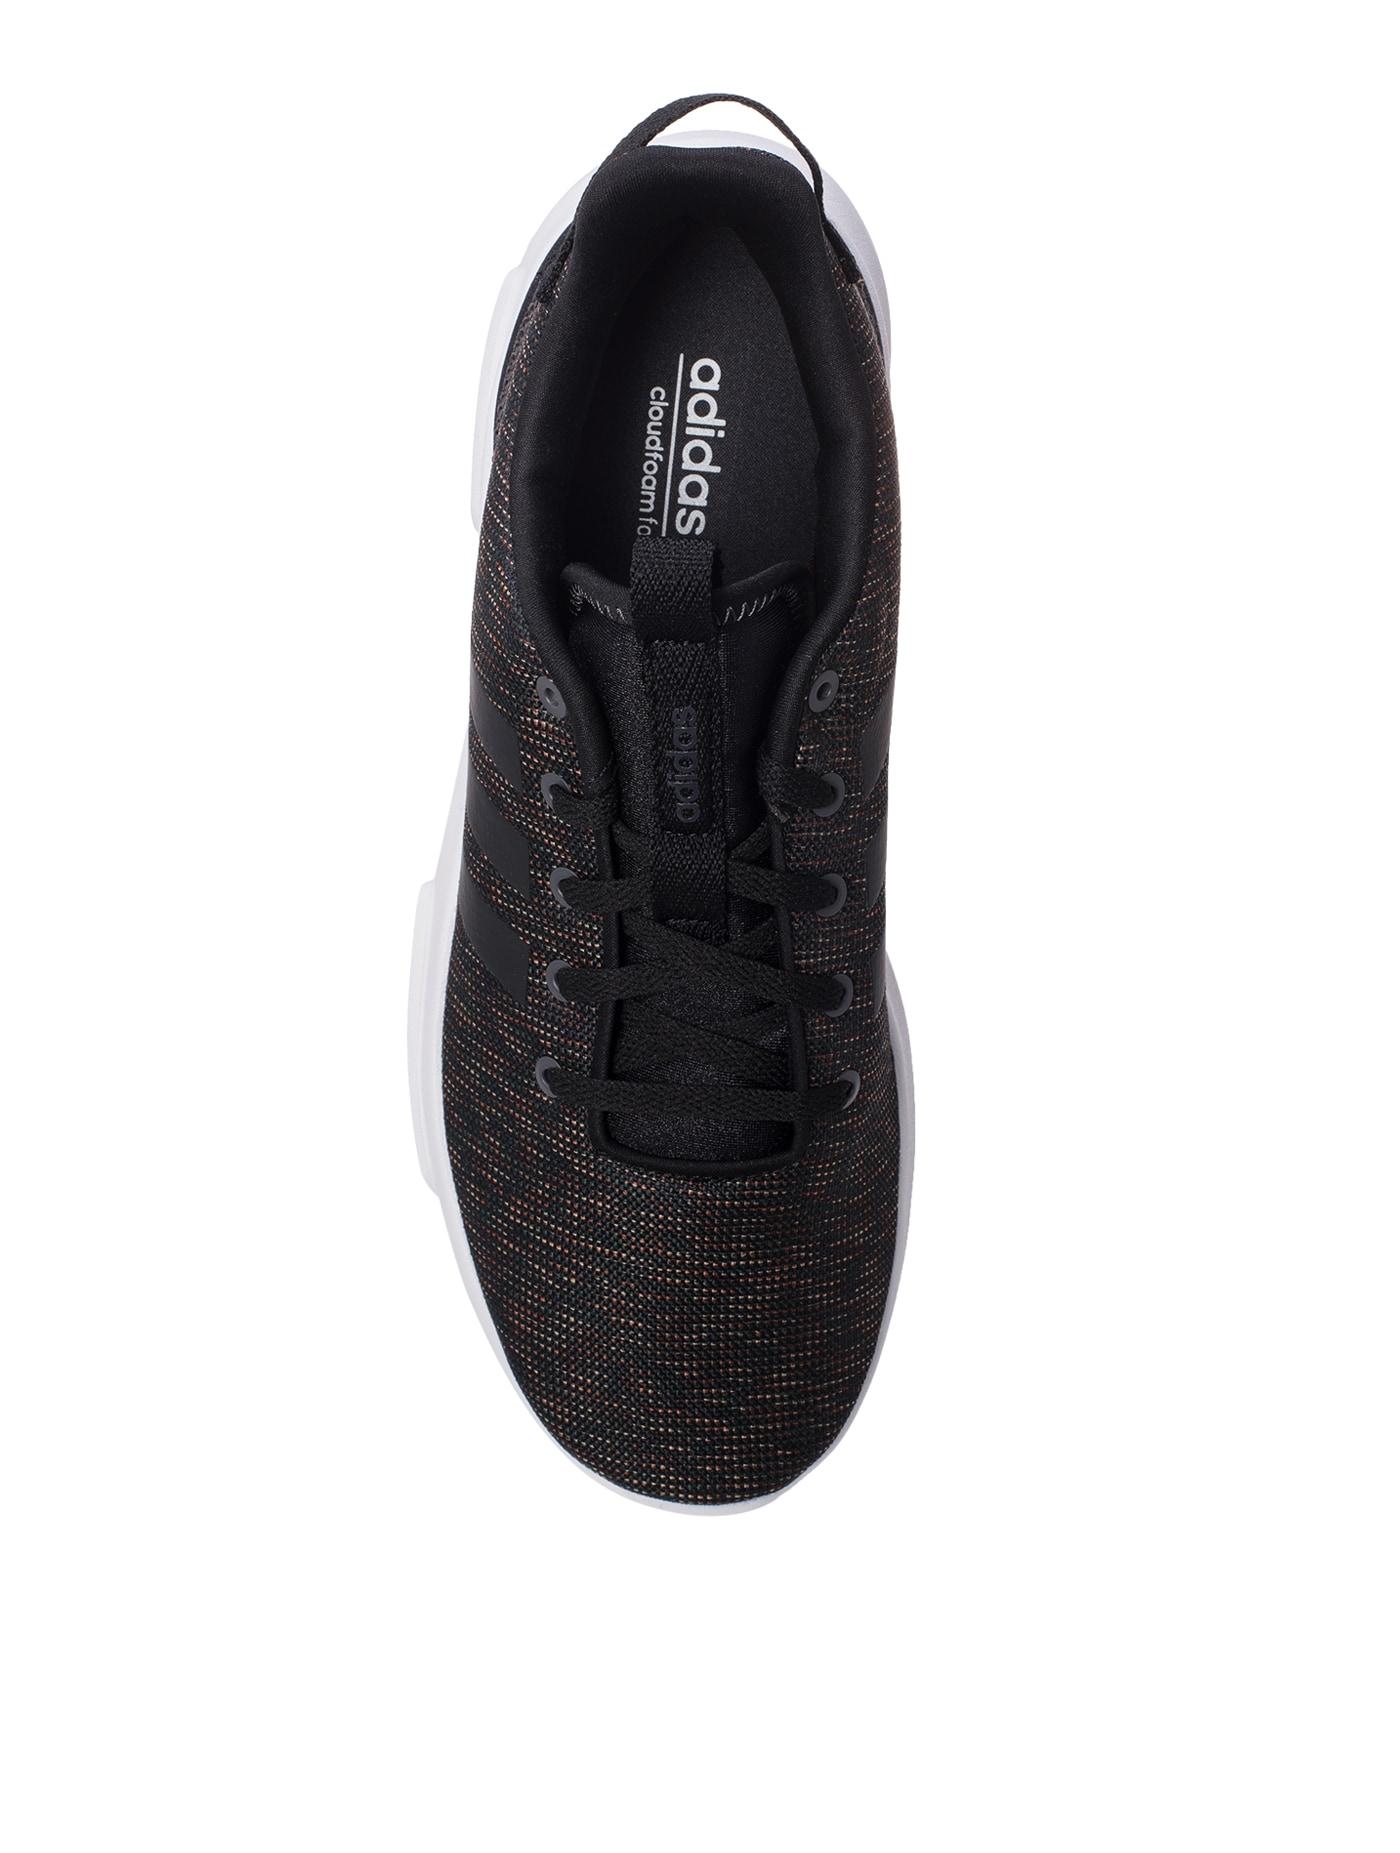 ADIDAS NEO Men's Casual Shoes Cloudfoam Racer TR CG572